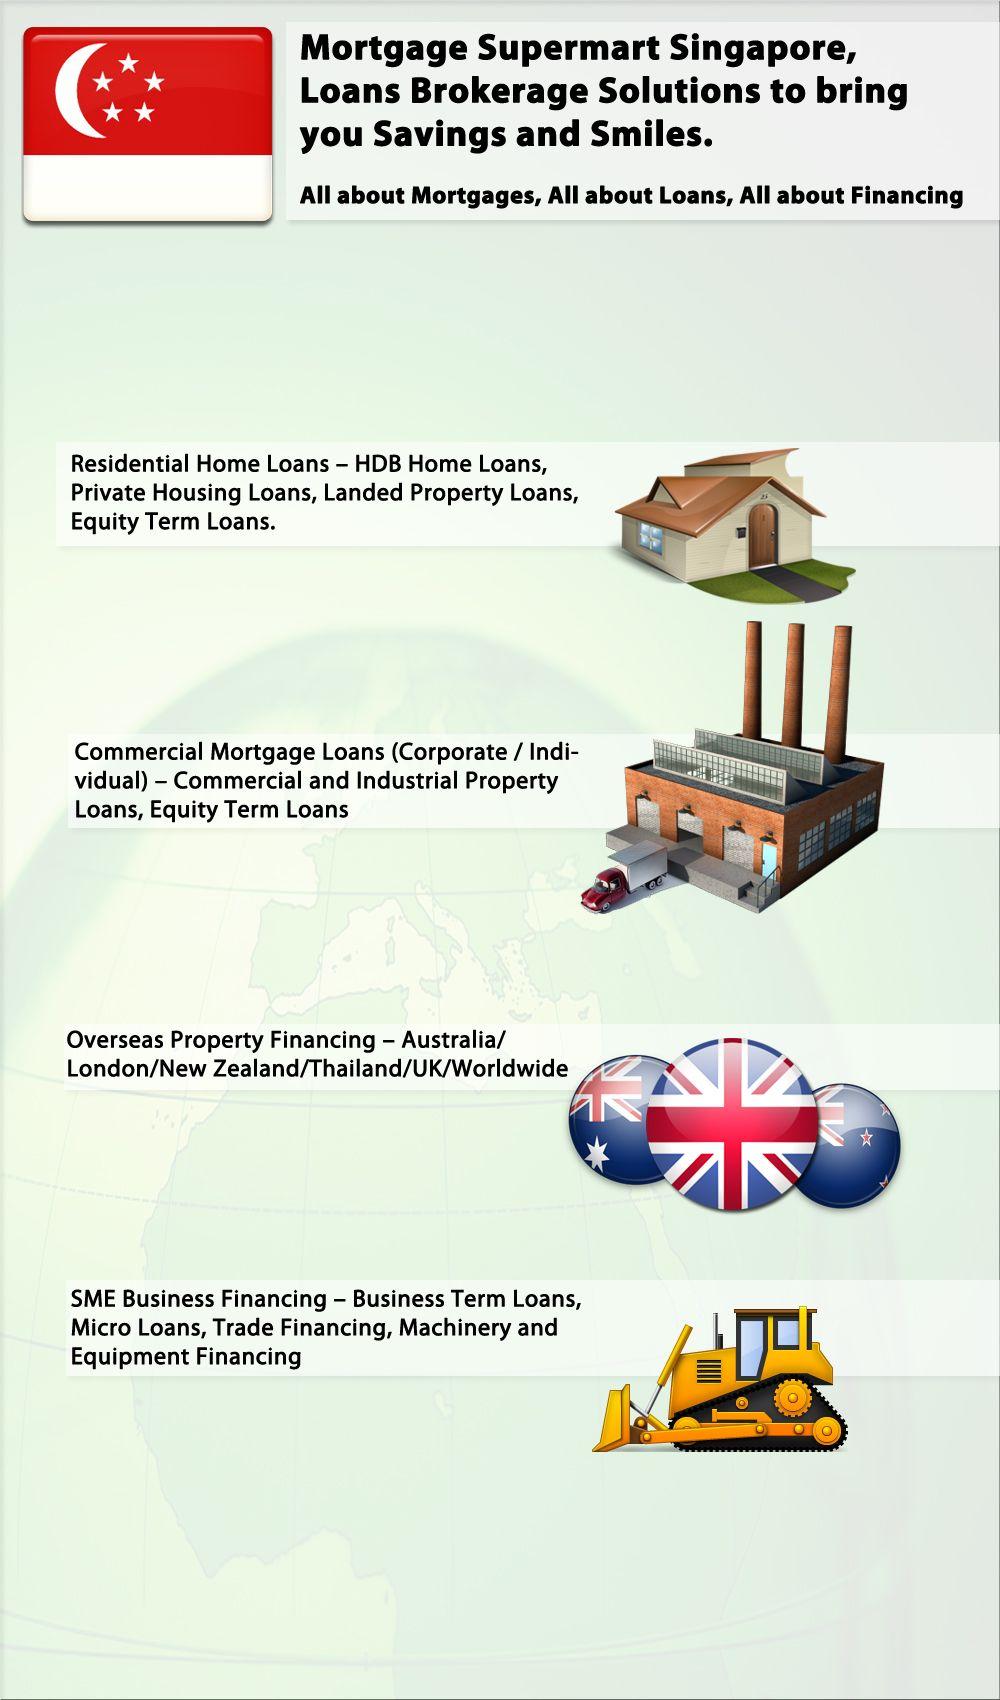 Services Http Www Sgmortgagesupermart Com Http Www Sgmortgagesupermart Com Apps Blog Mortgage Loans Mortgage Singapore